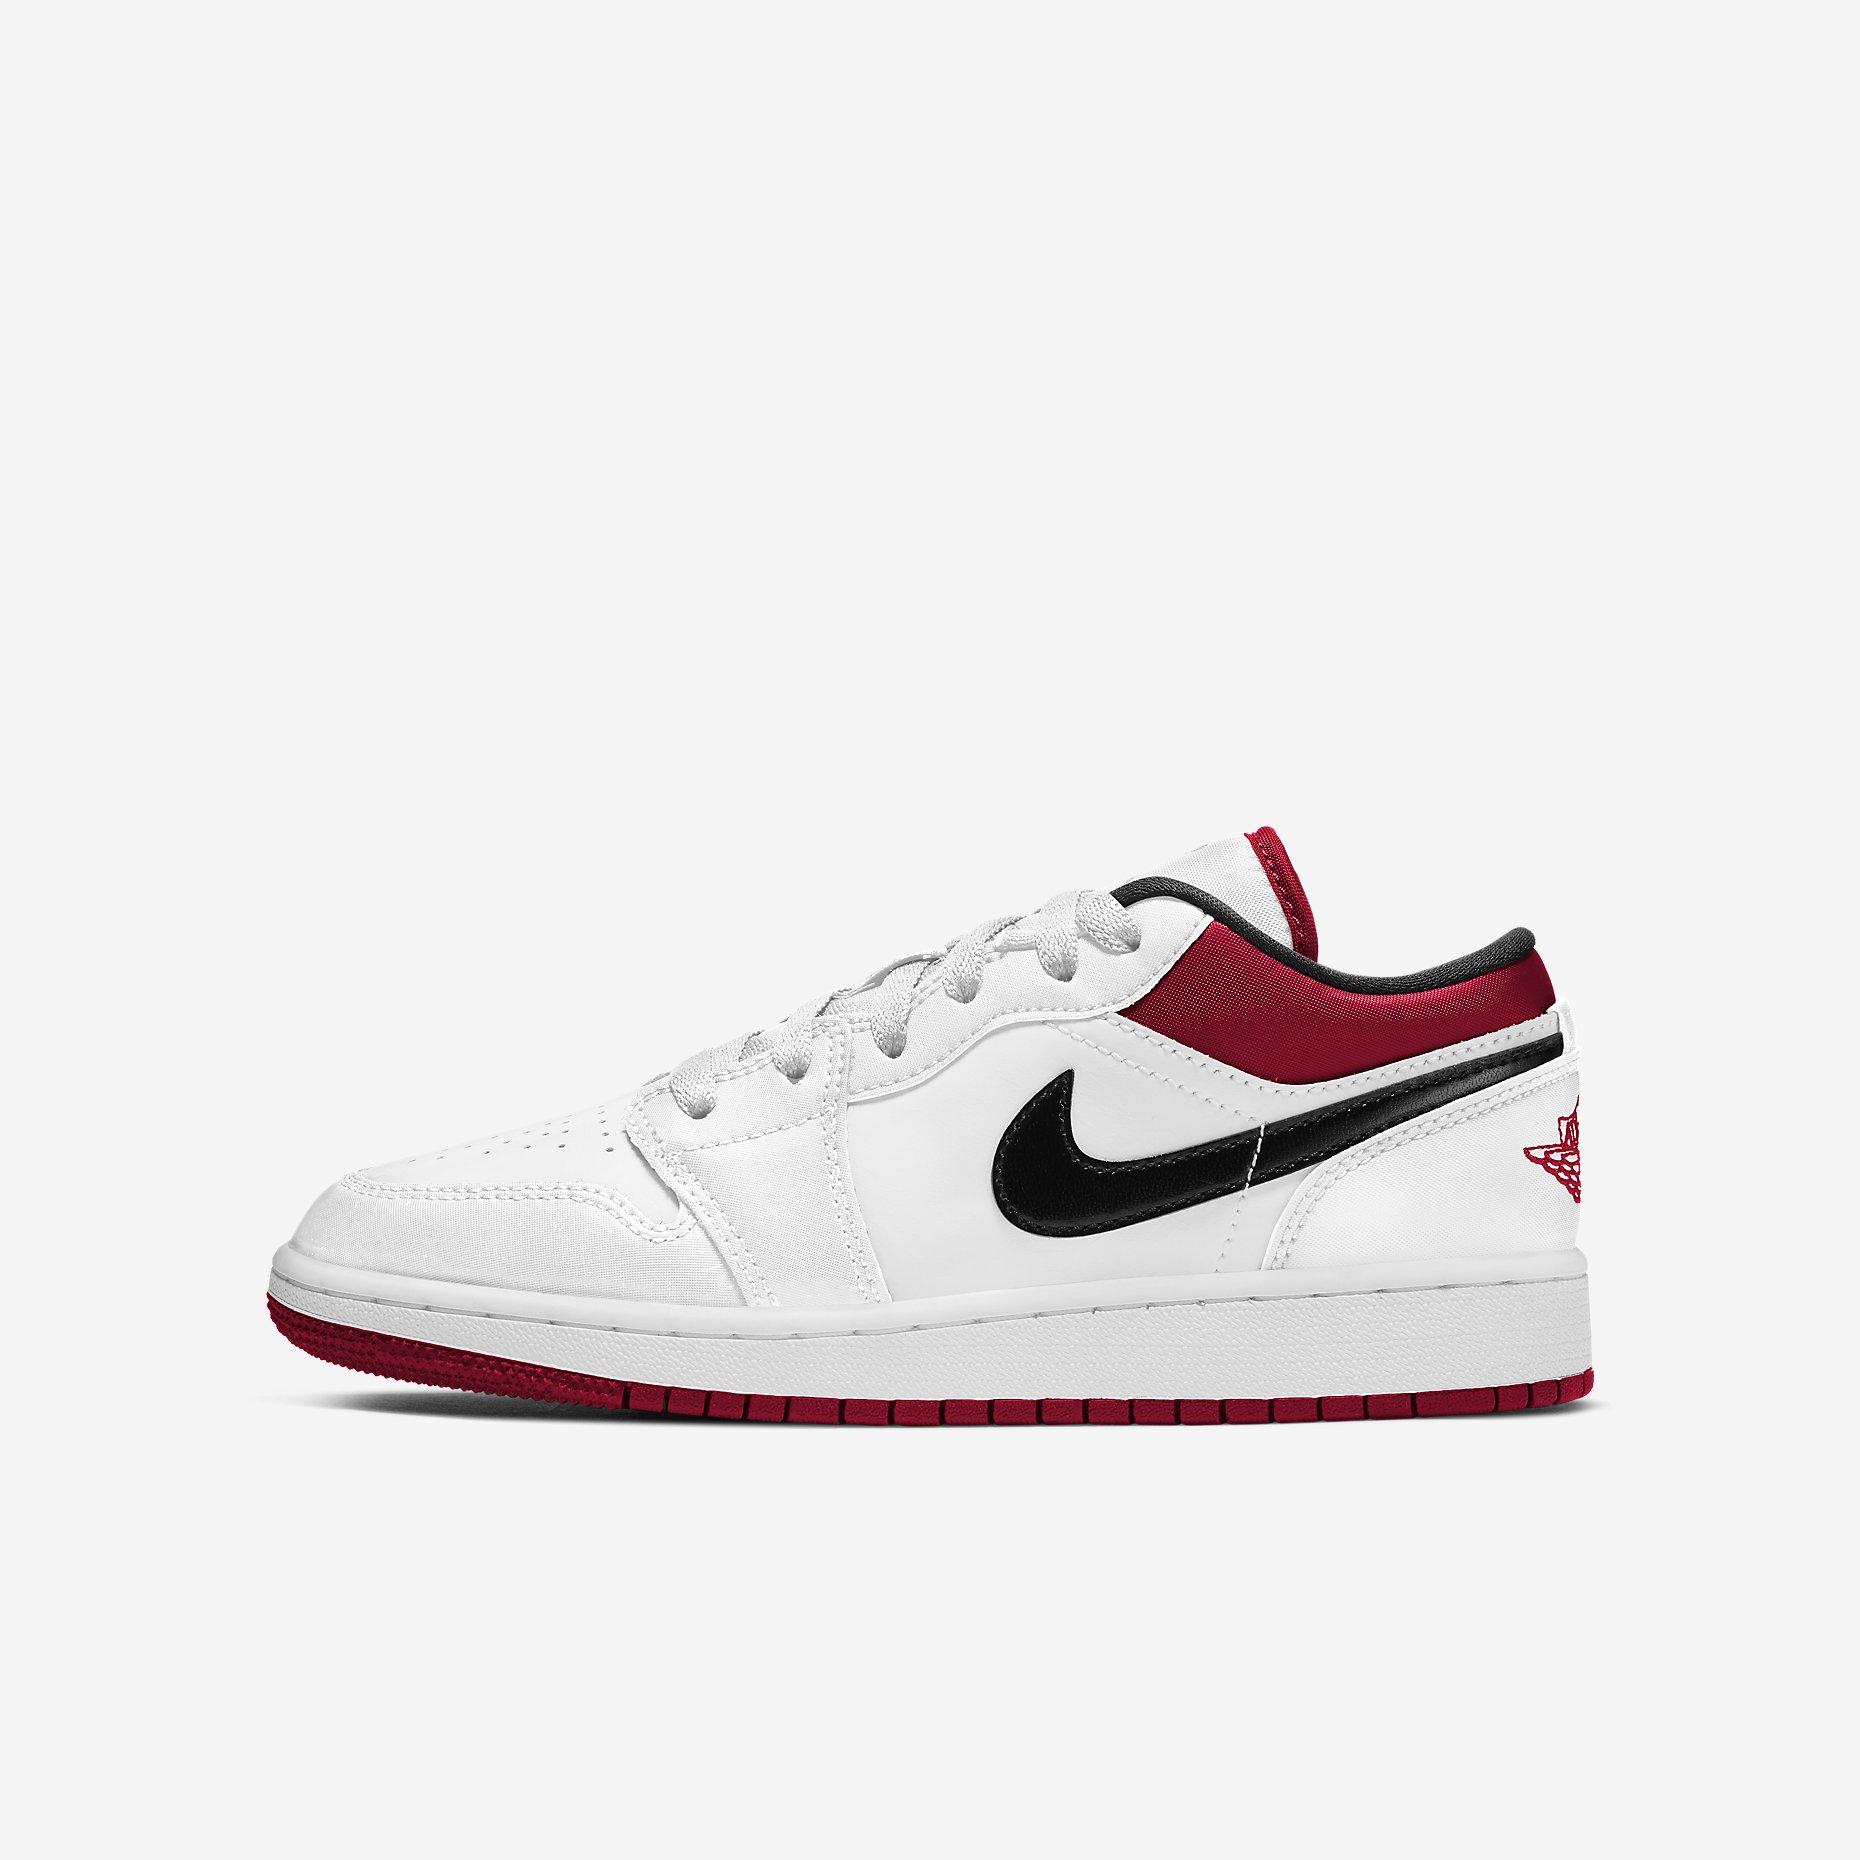 Air Jordan 1 Low GS 'White Black Gym Red'